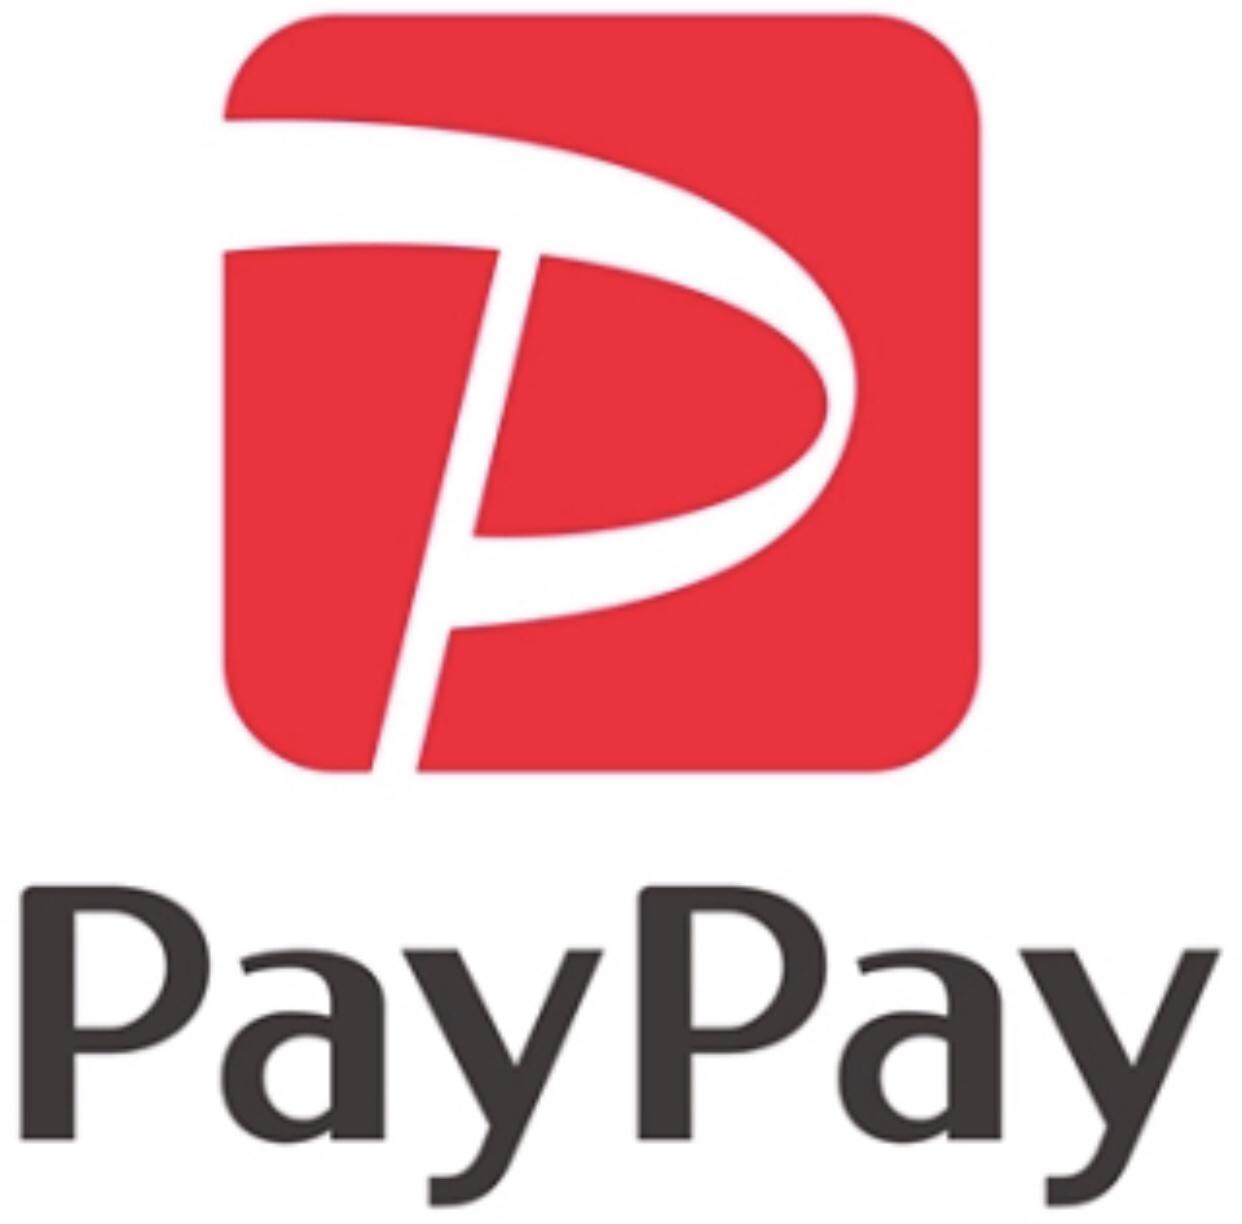 PayPay利用開始_e0230154_01065815.jpg